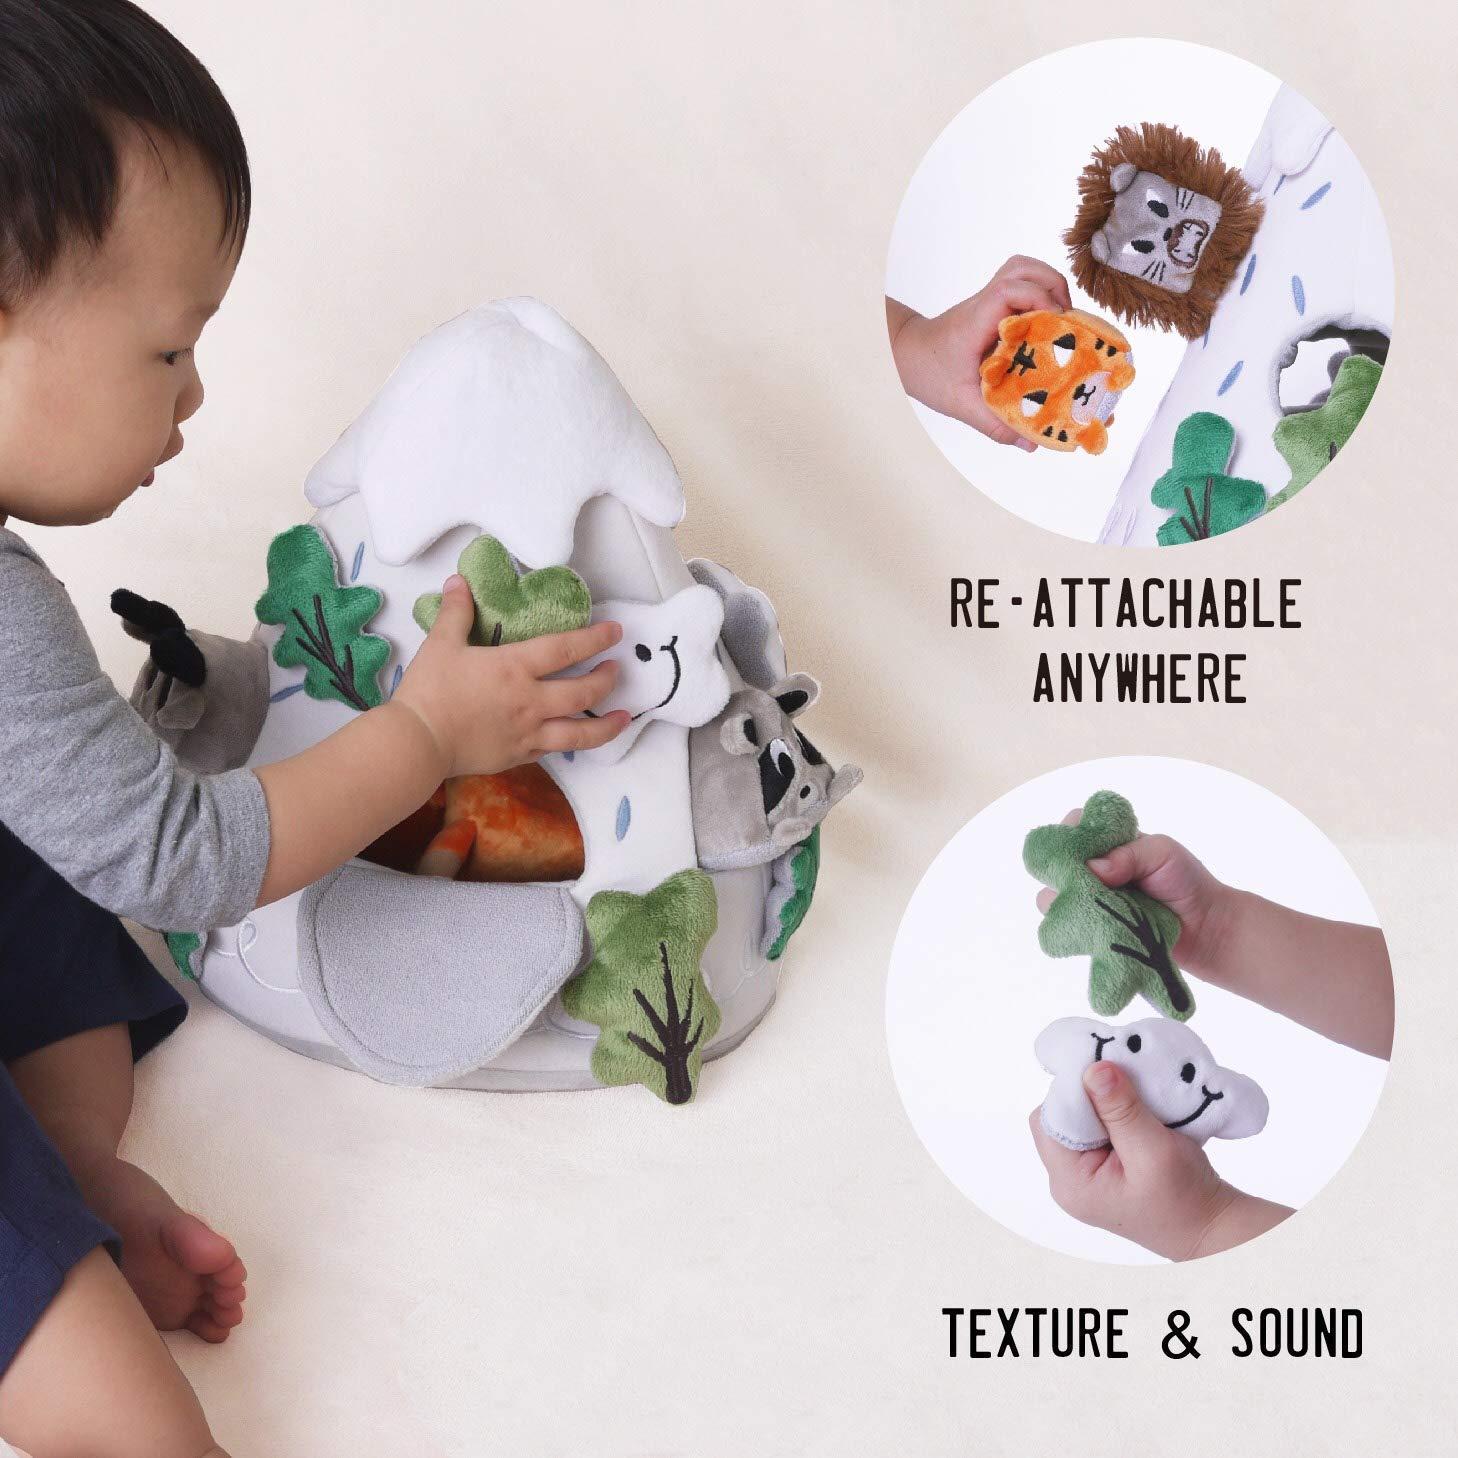 OK!DZO 12'' Mountain & Animal Shape Sorter Plush Developmental Toy Set (16 pcs)- Cognitive & Motor & Social Skills- Fun Bright Colors & Textures for Babies 0-36 Months by OK!DZO (Image #5)